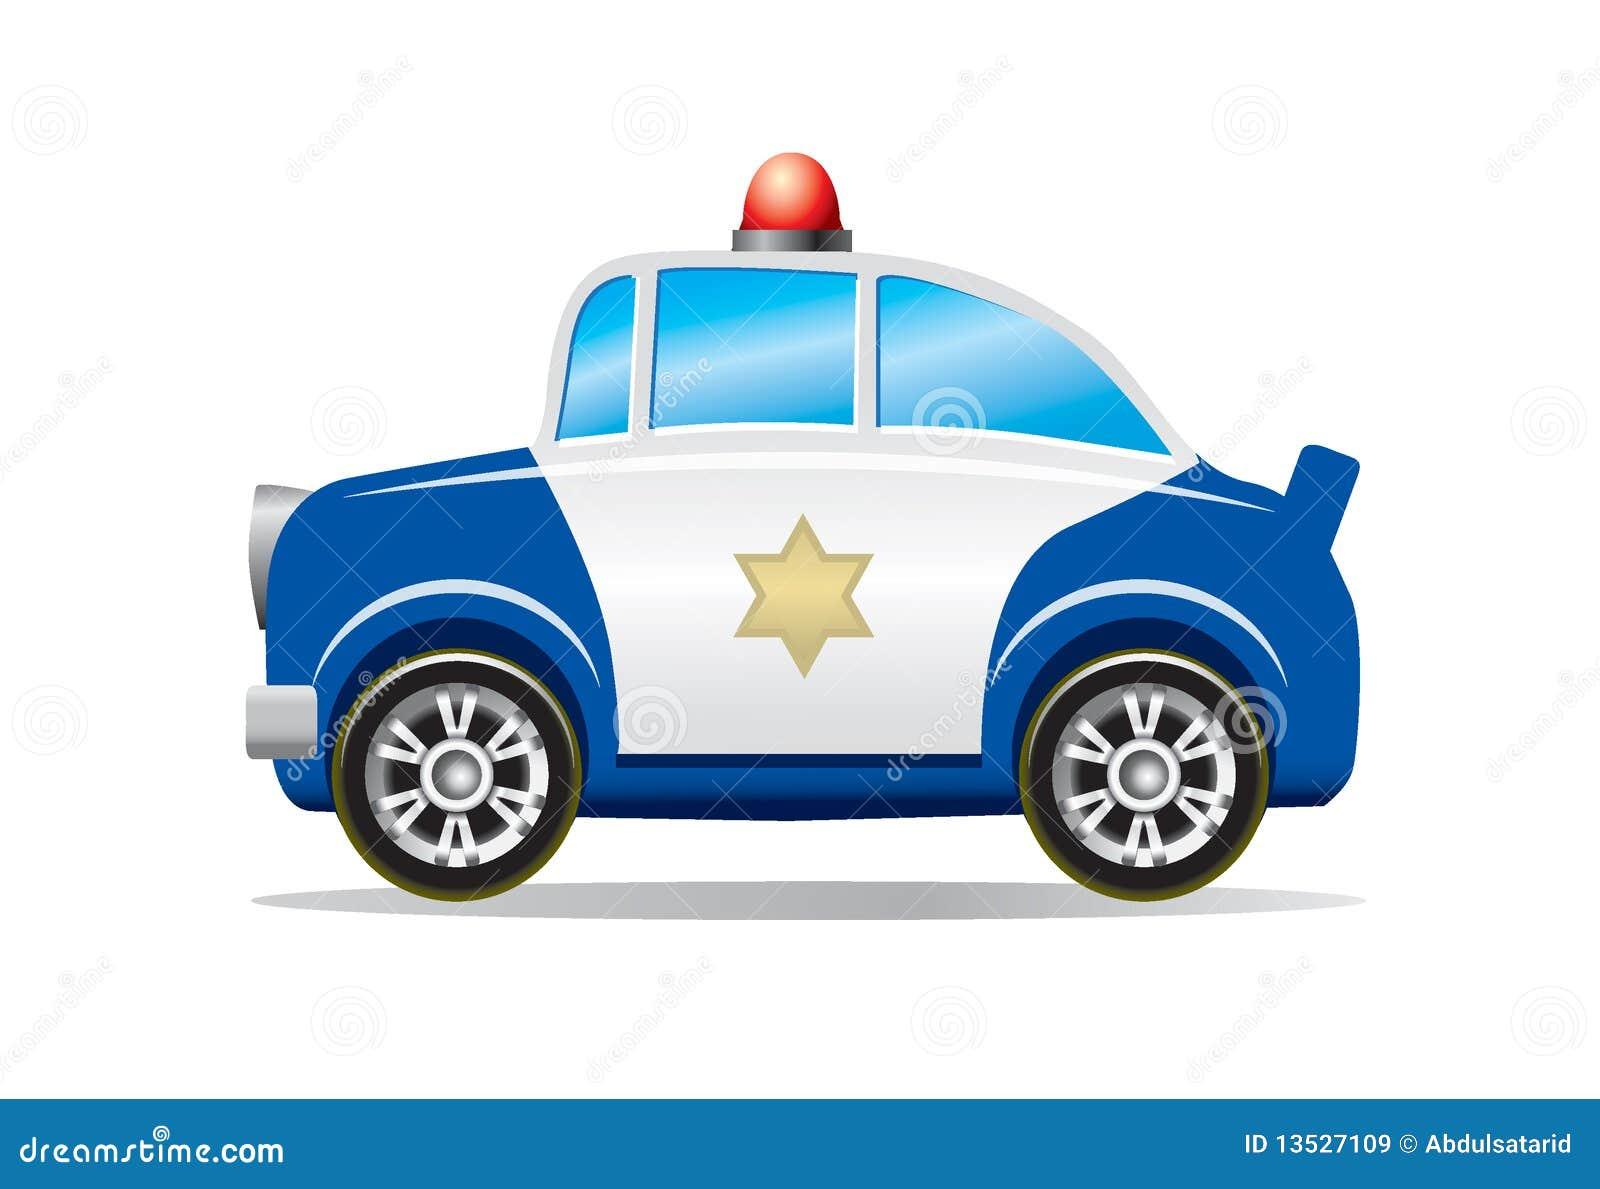 Dessin anim de v hicule de police images libres de droits - Dessin de police ...